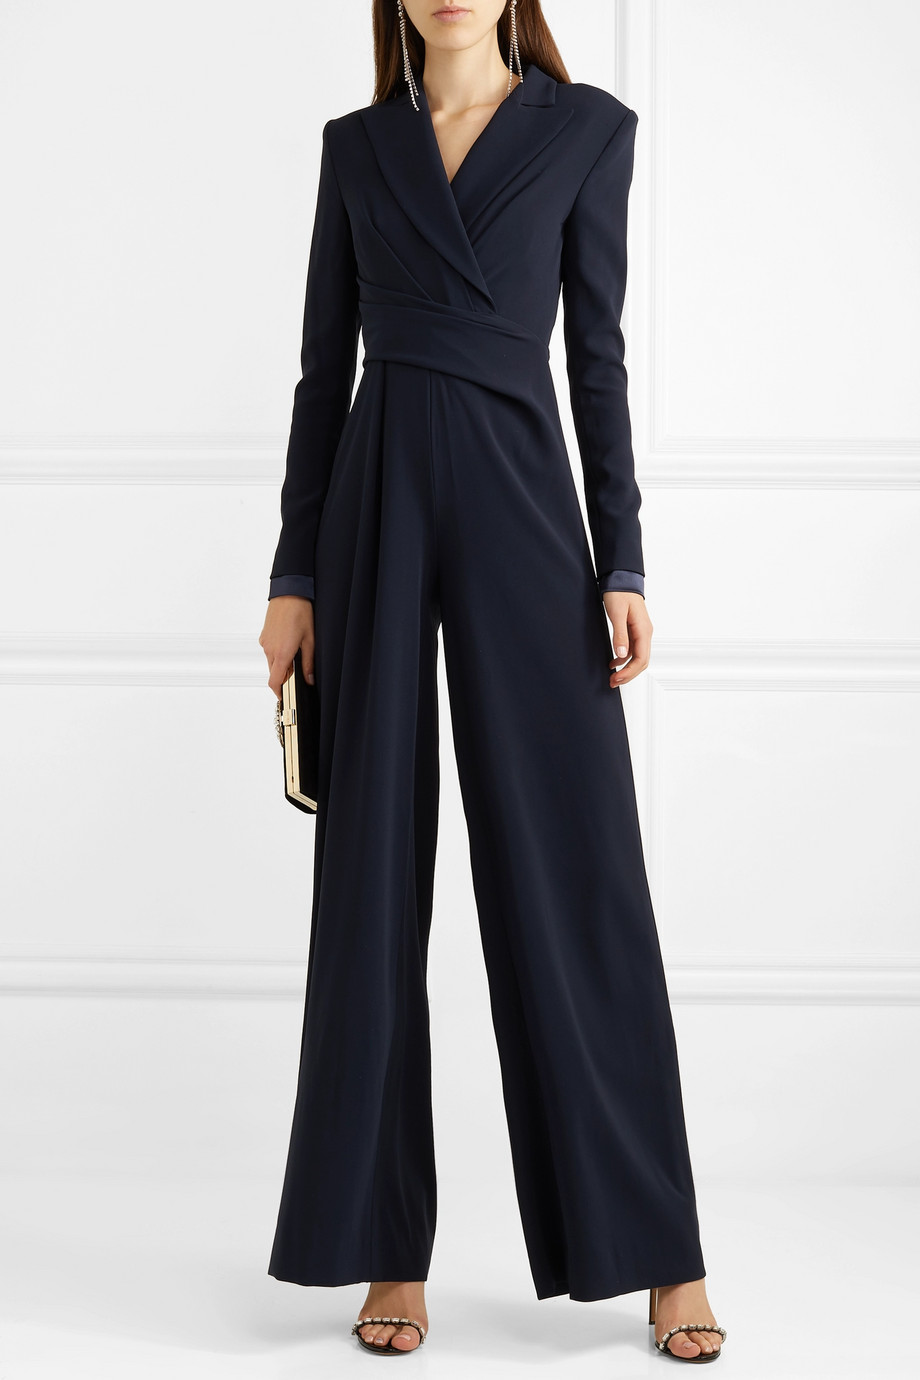 Talbot Runhof Bisini satin-trimmed draped crepe jumpsuit